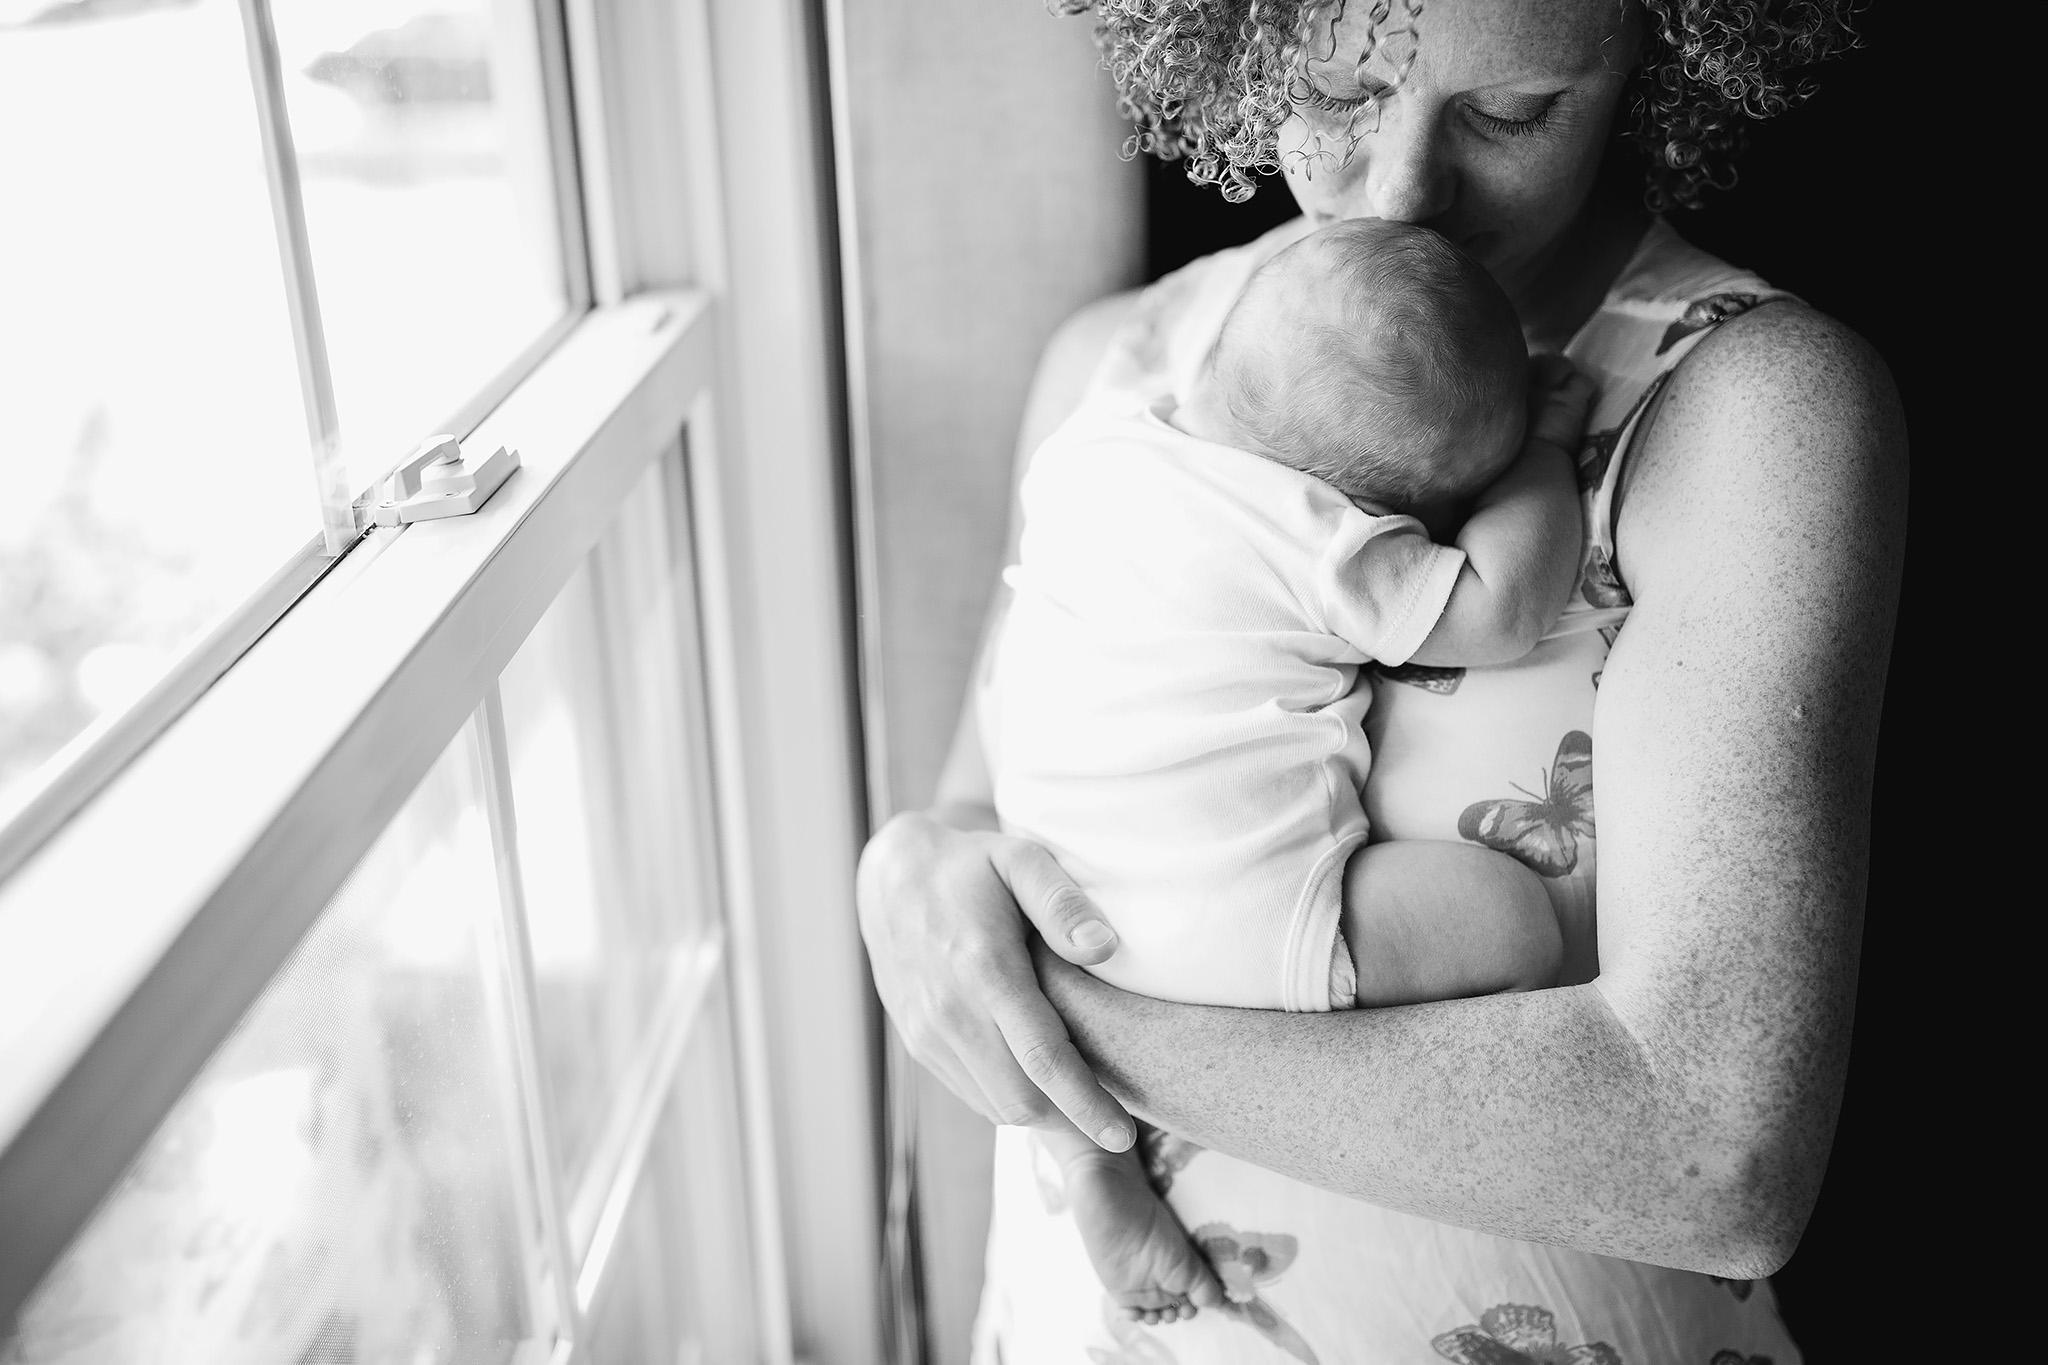 london_ontario_newborn_lifestyle_photographer-best_of_2018-raw_footage_photography068.jpg